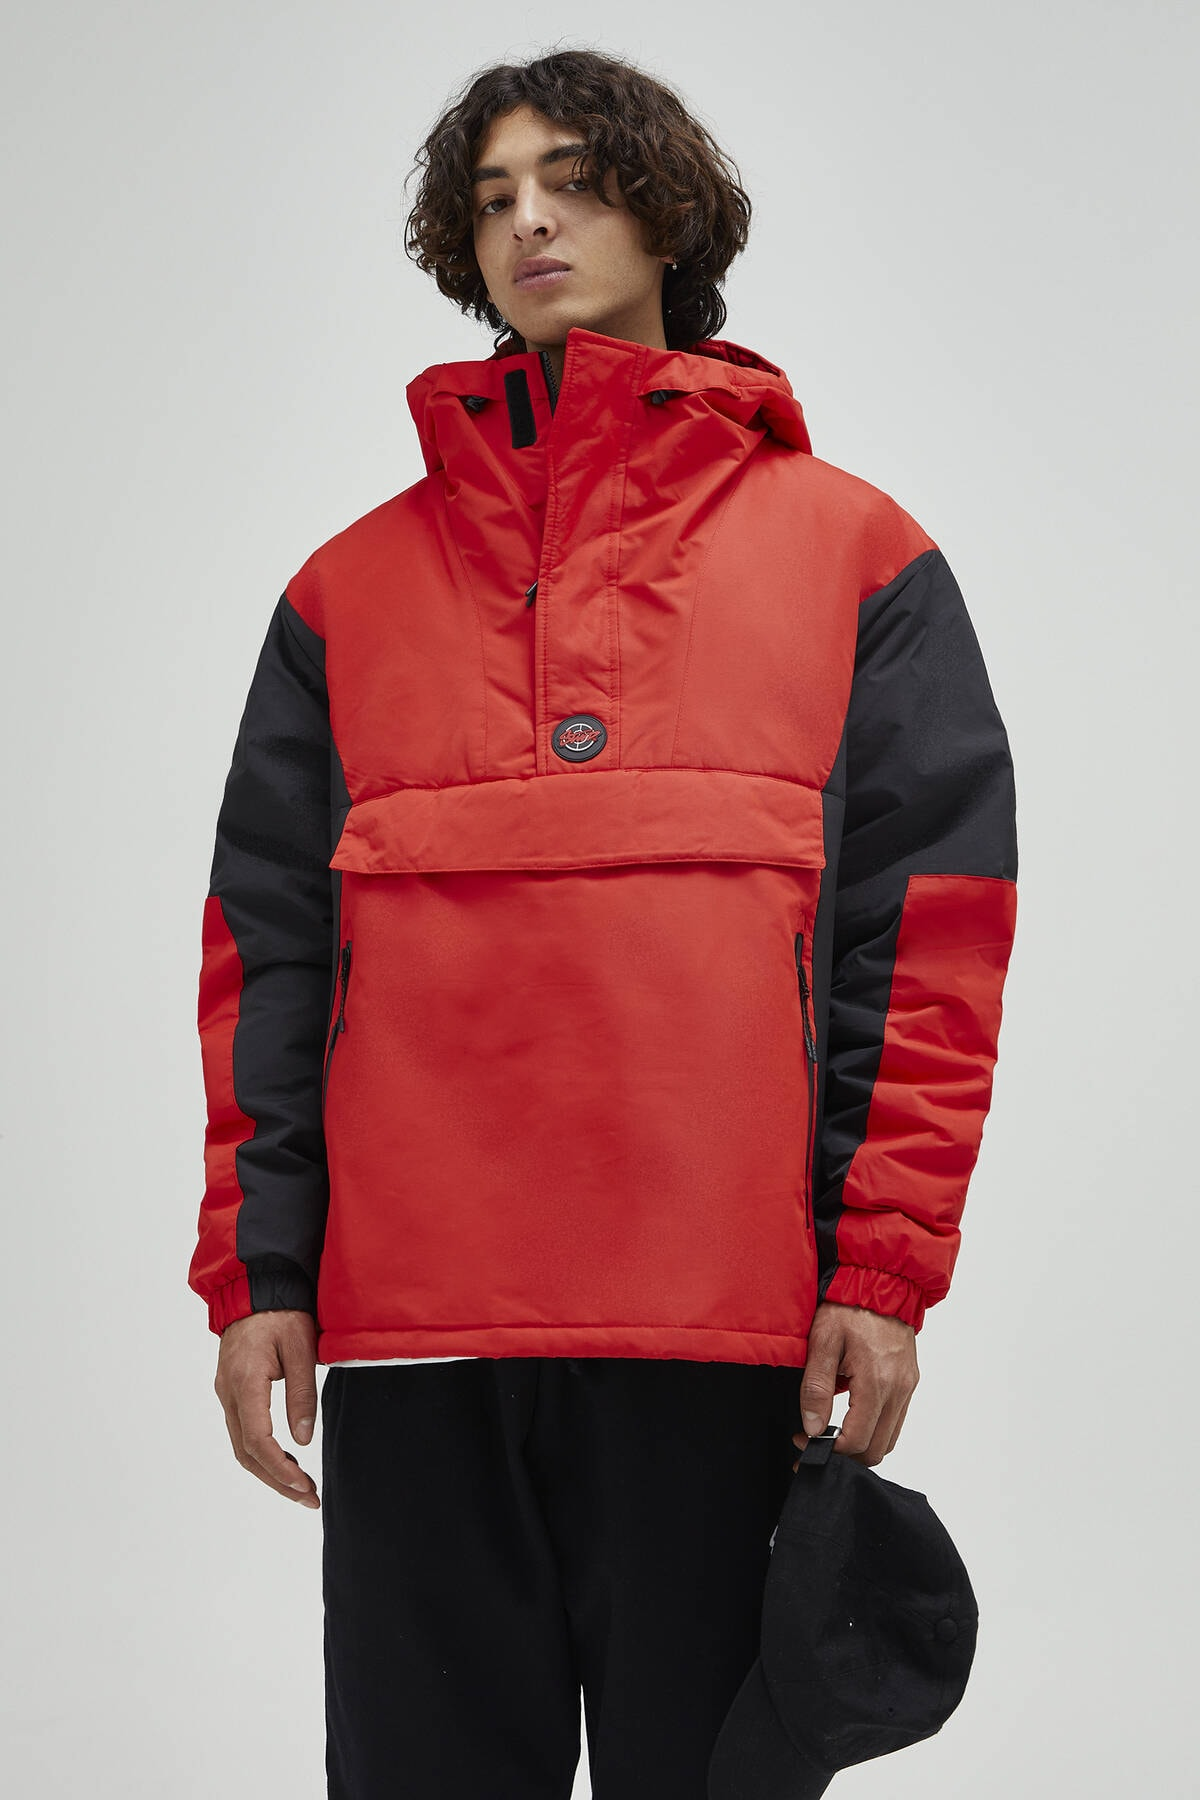 Pull & Bear Erkek Kırmızı Logolu Fermuarlı Kanguru Mont 09710526